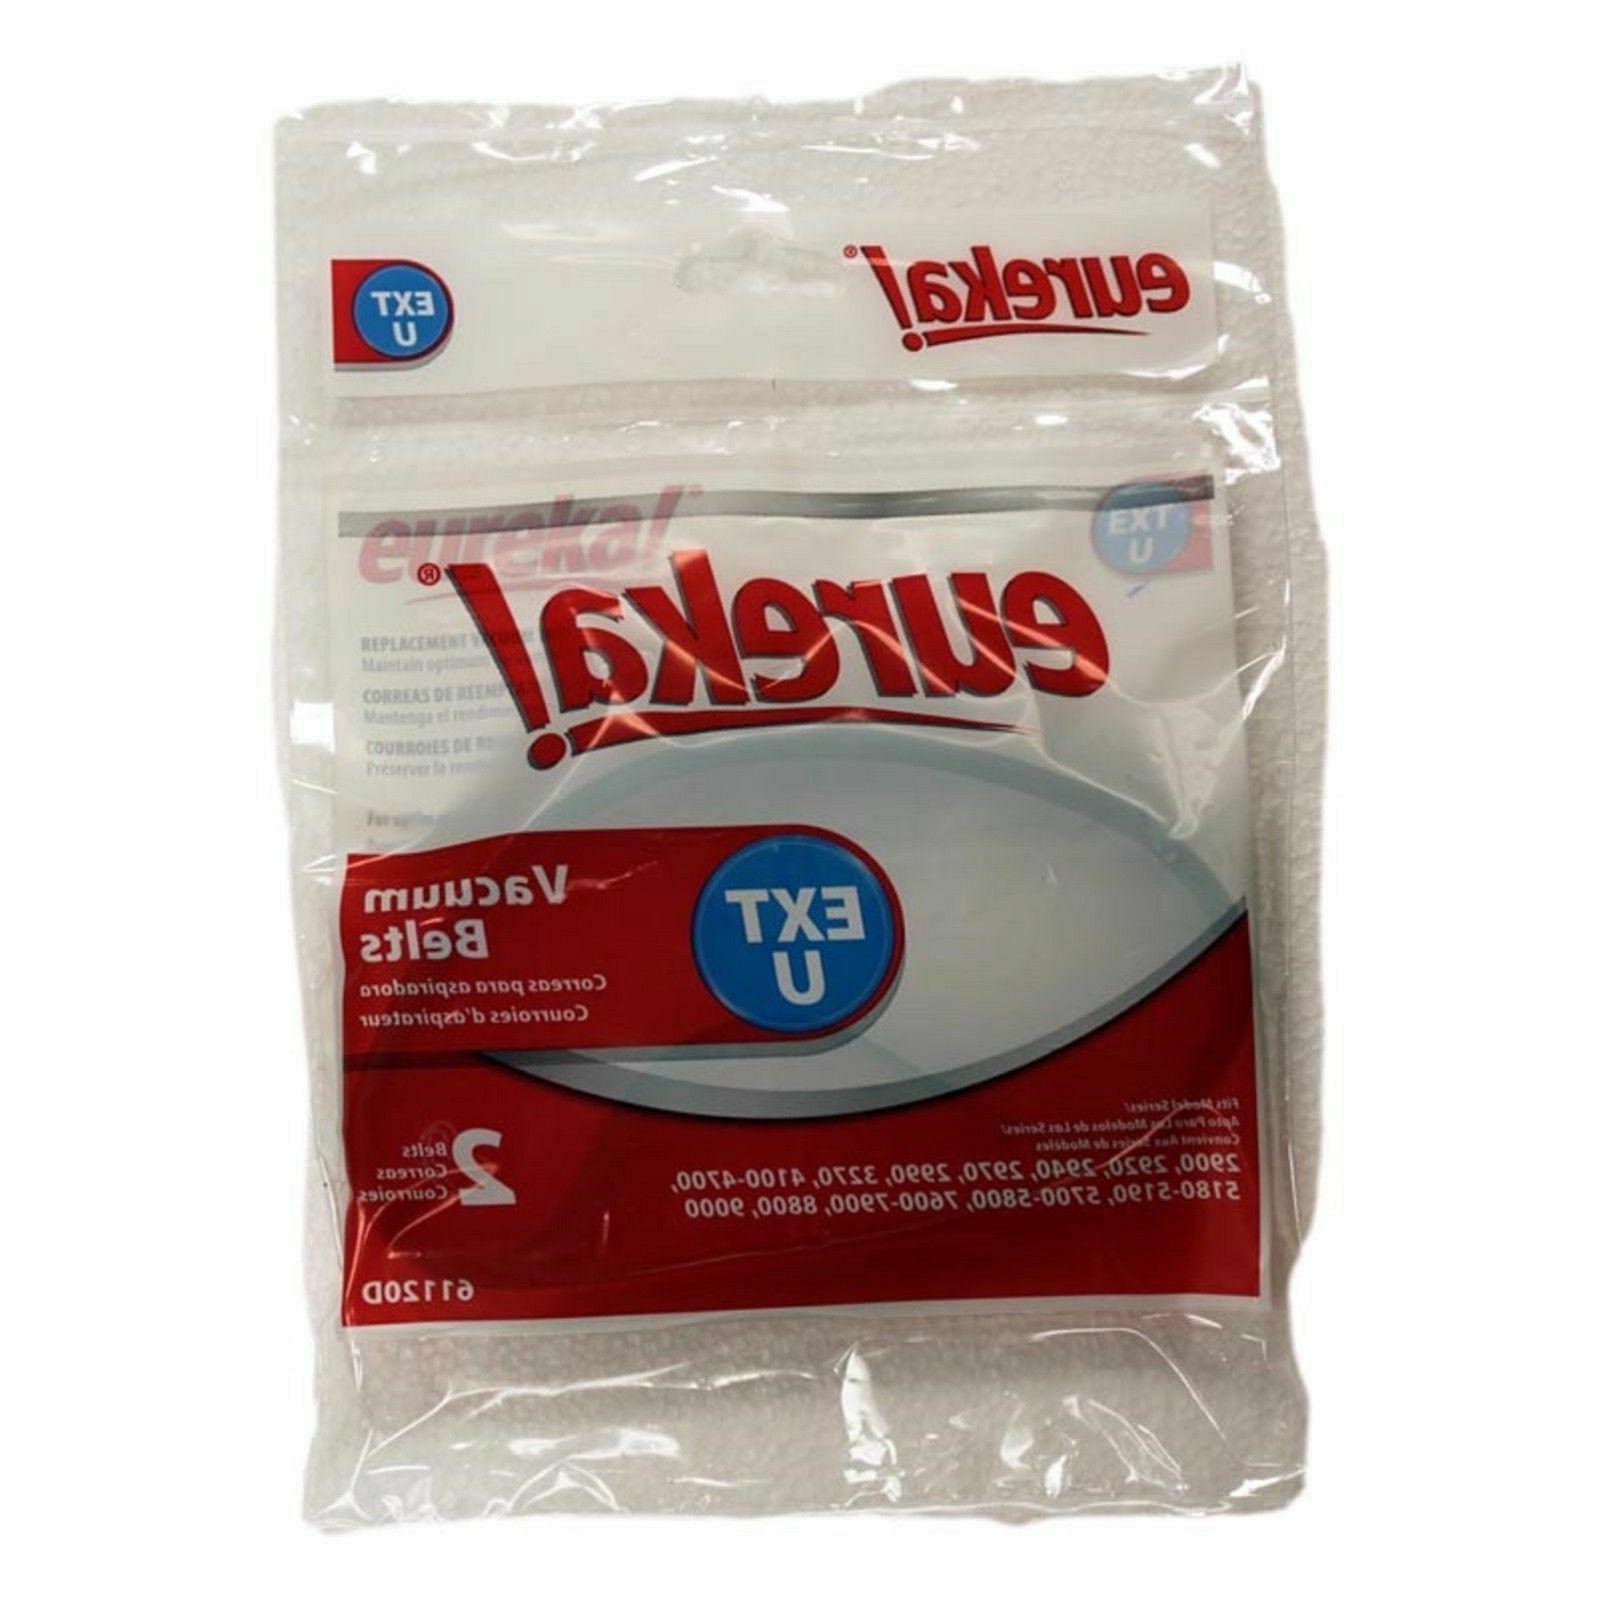 Eureka Electrolux Sanitaire Belt U Style 2 pack #61120A